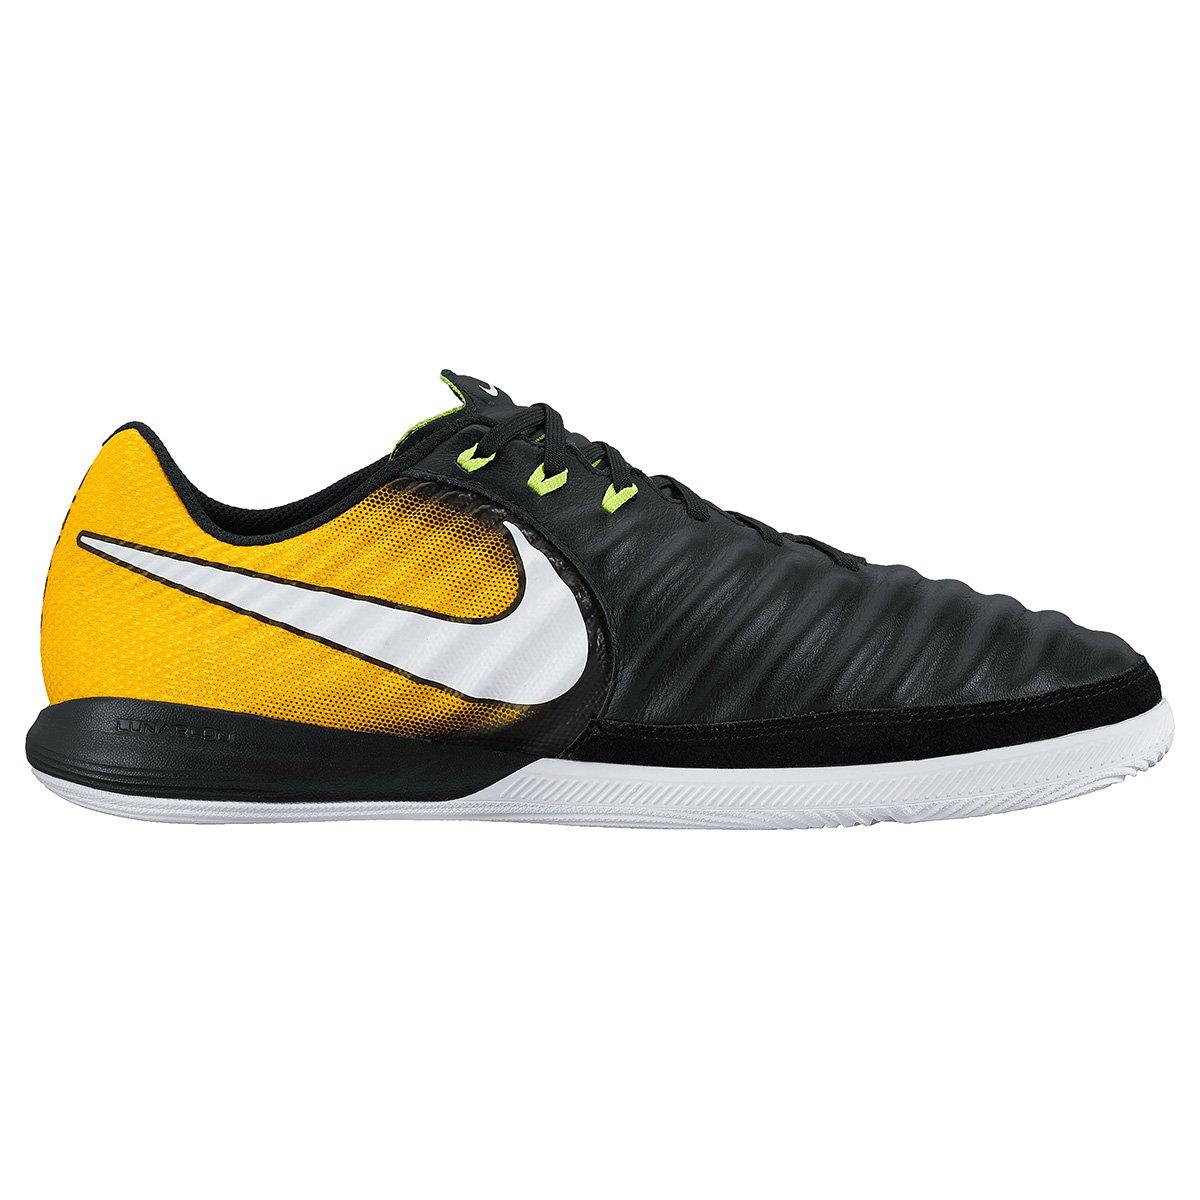 f62b72309c Chuteira Futsal Nike Tiempo Finale IC - Compre Agora